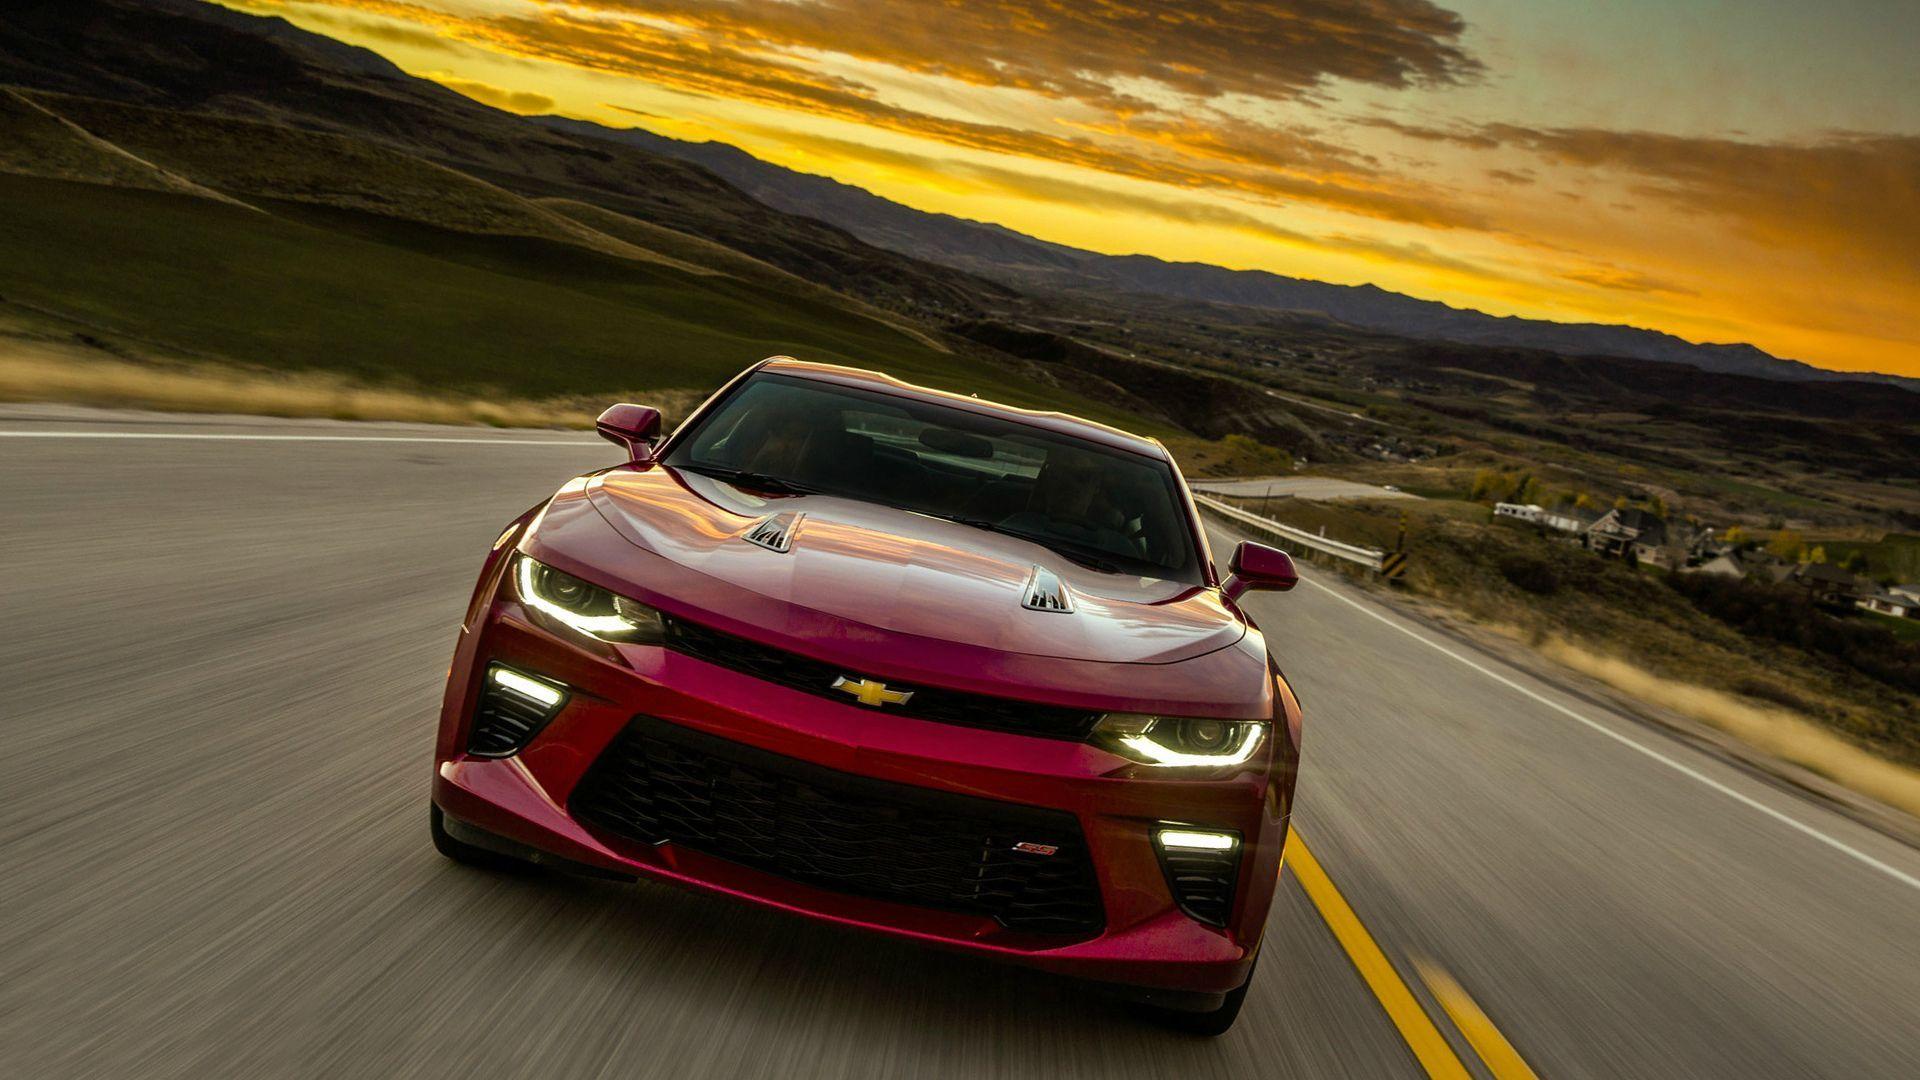 Chevrolet Camaro HD Cars Wallpapers - Wallpaper Cave